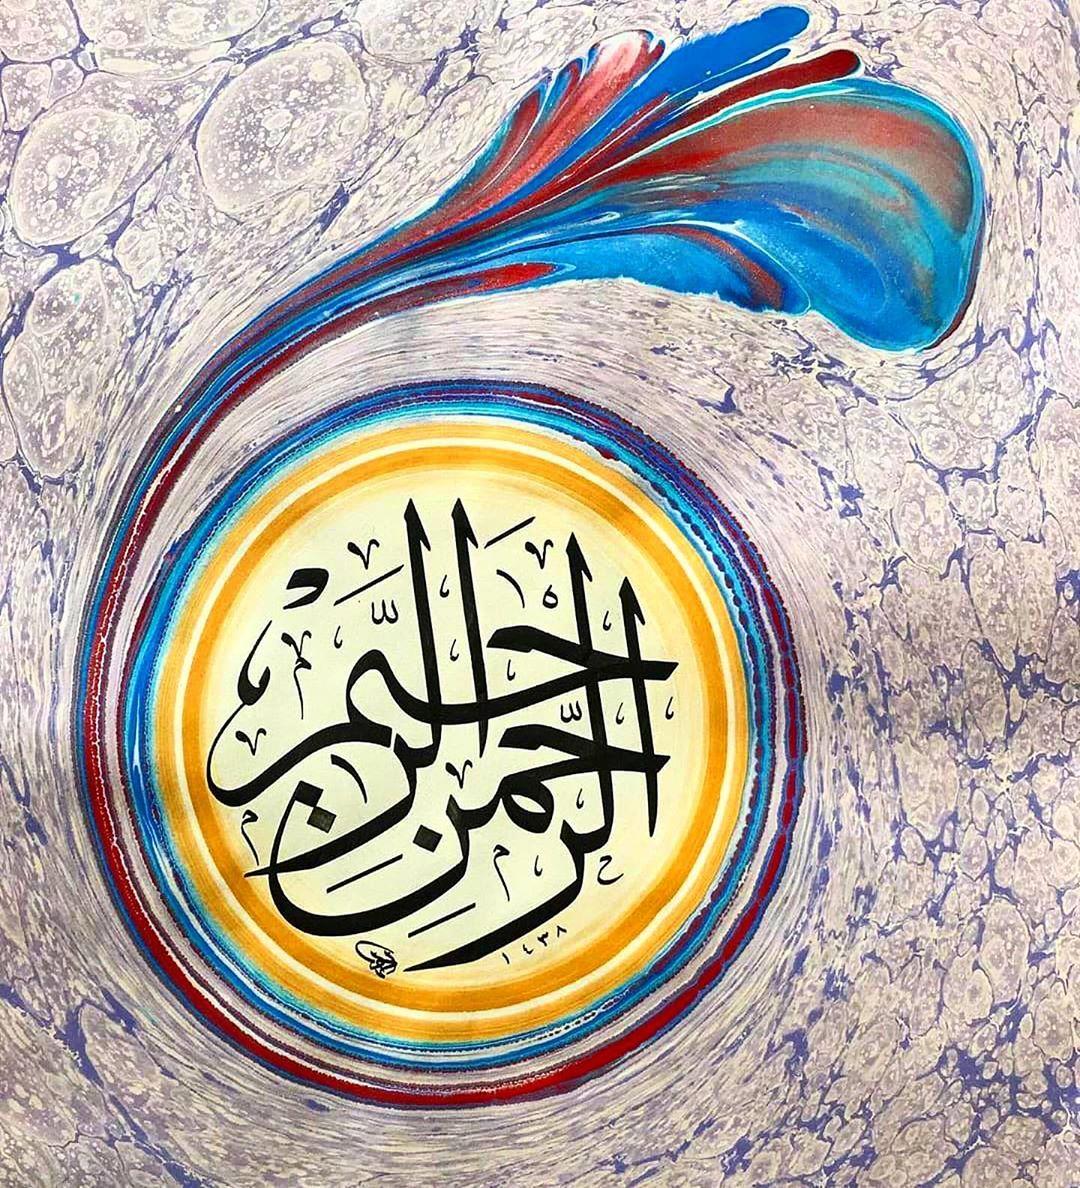 Donwload Photo Khat Art by @hattatahmetbursali @dokusu  #islamicart #artwork #calligraphy #sanat #ha…